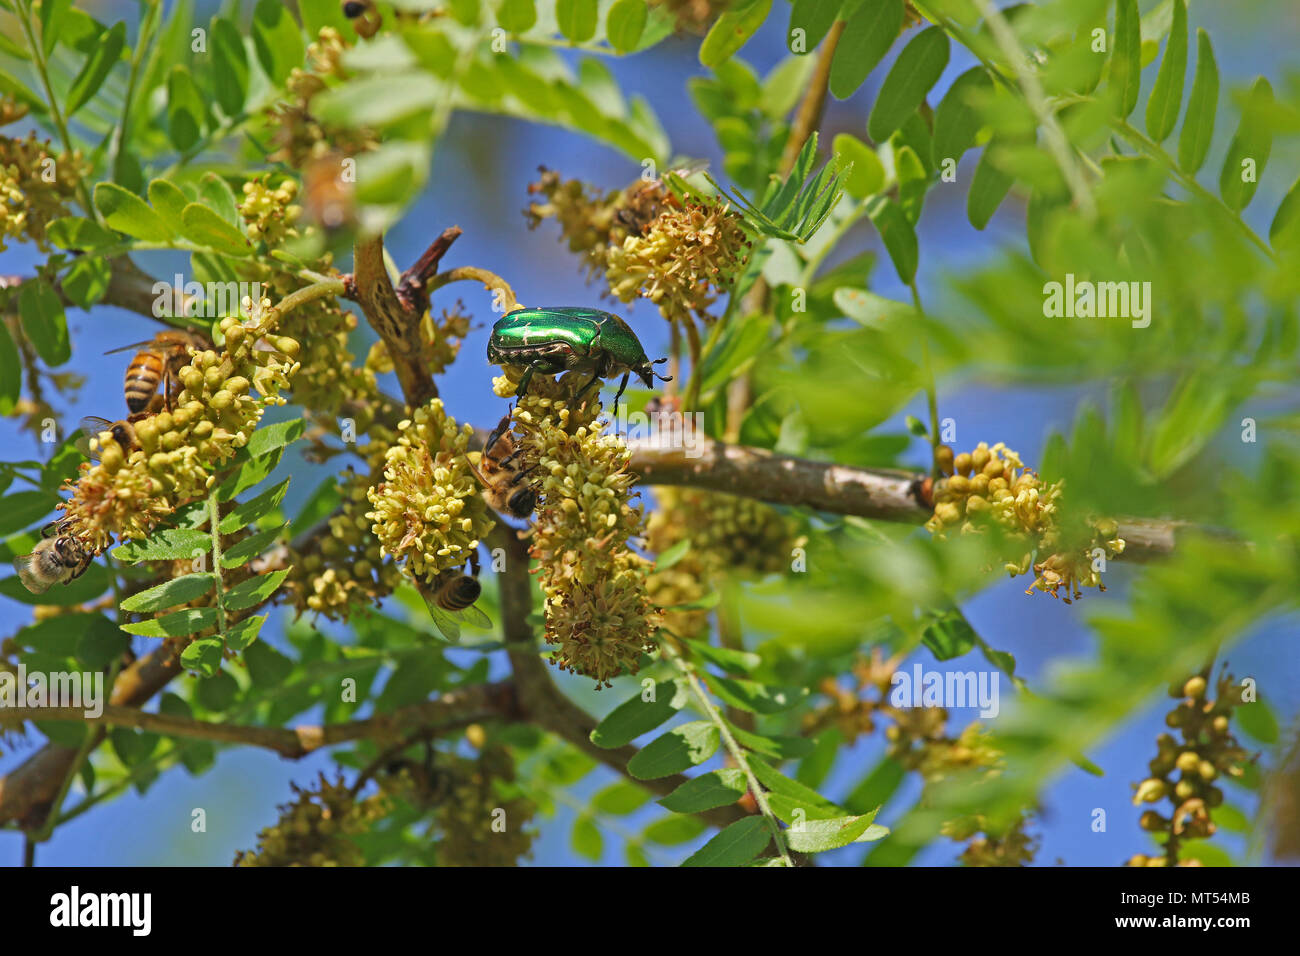 rose chafer beetle Latin cetonia aurata feeding on an acacia tree with honey bees apis mellifera in springtime in Italy - Stock Image